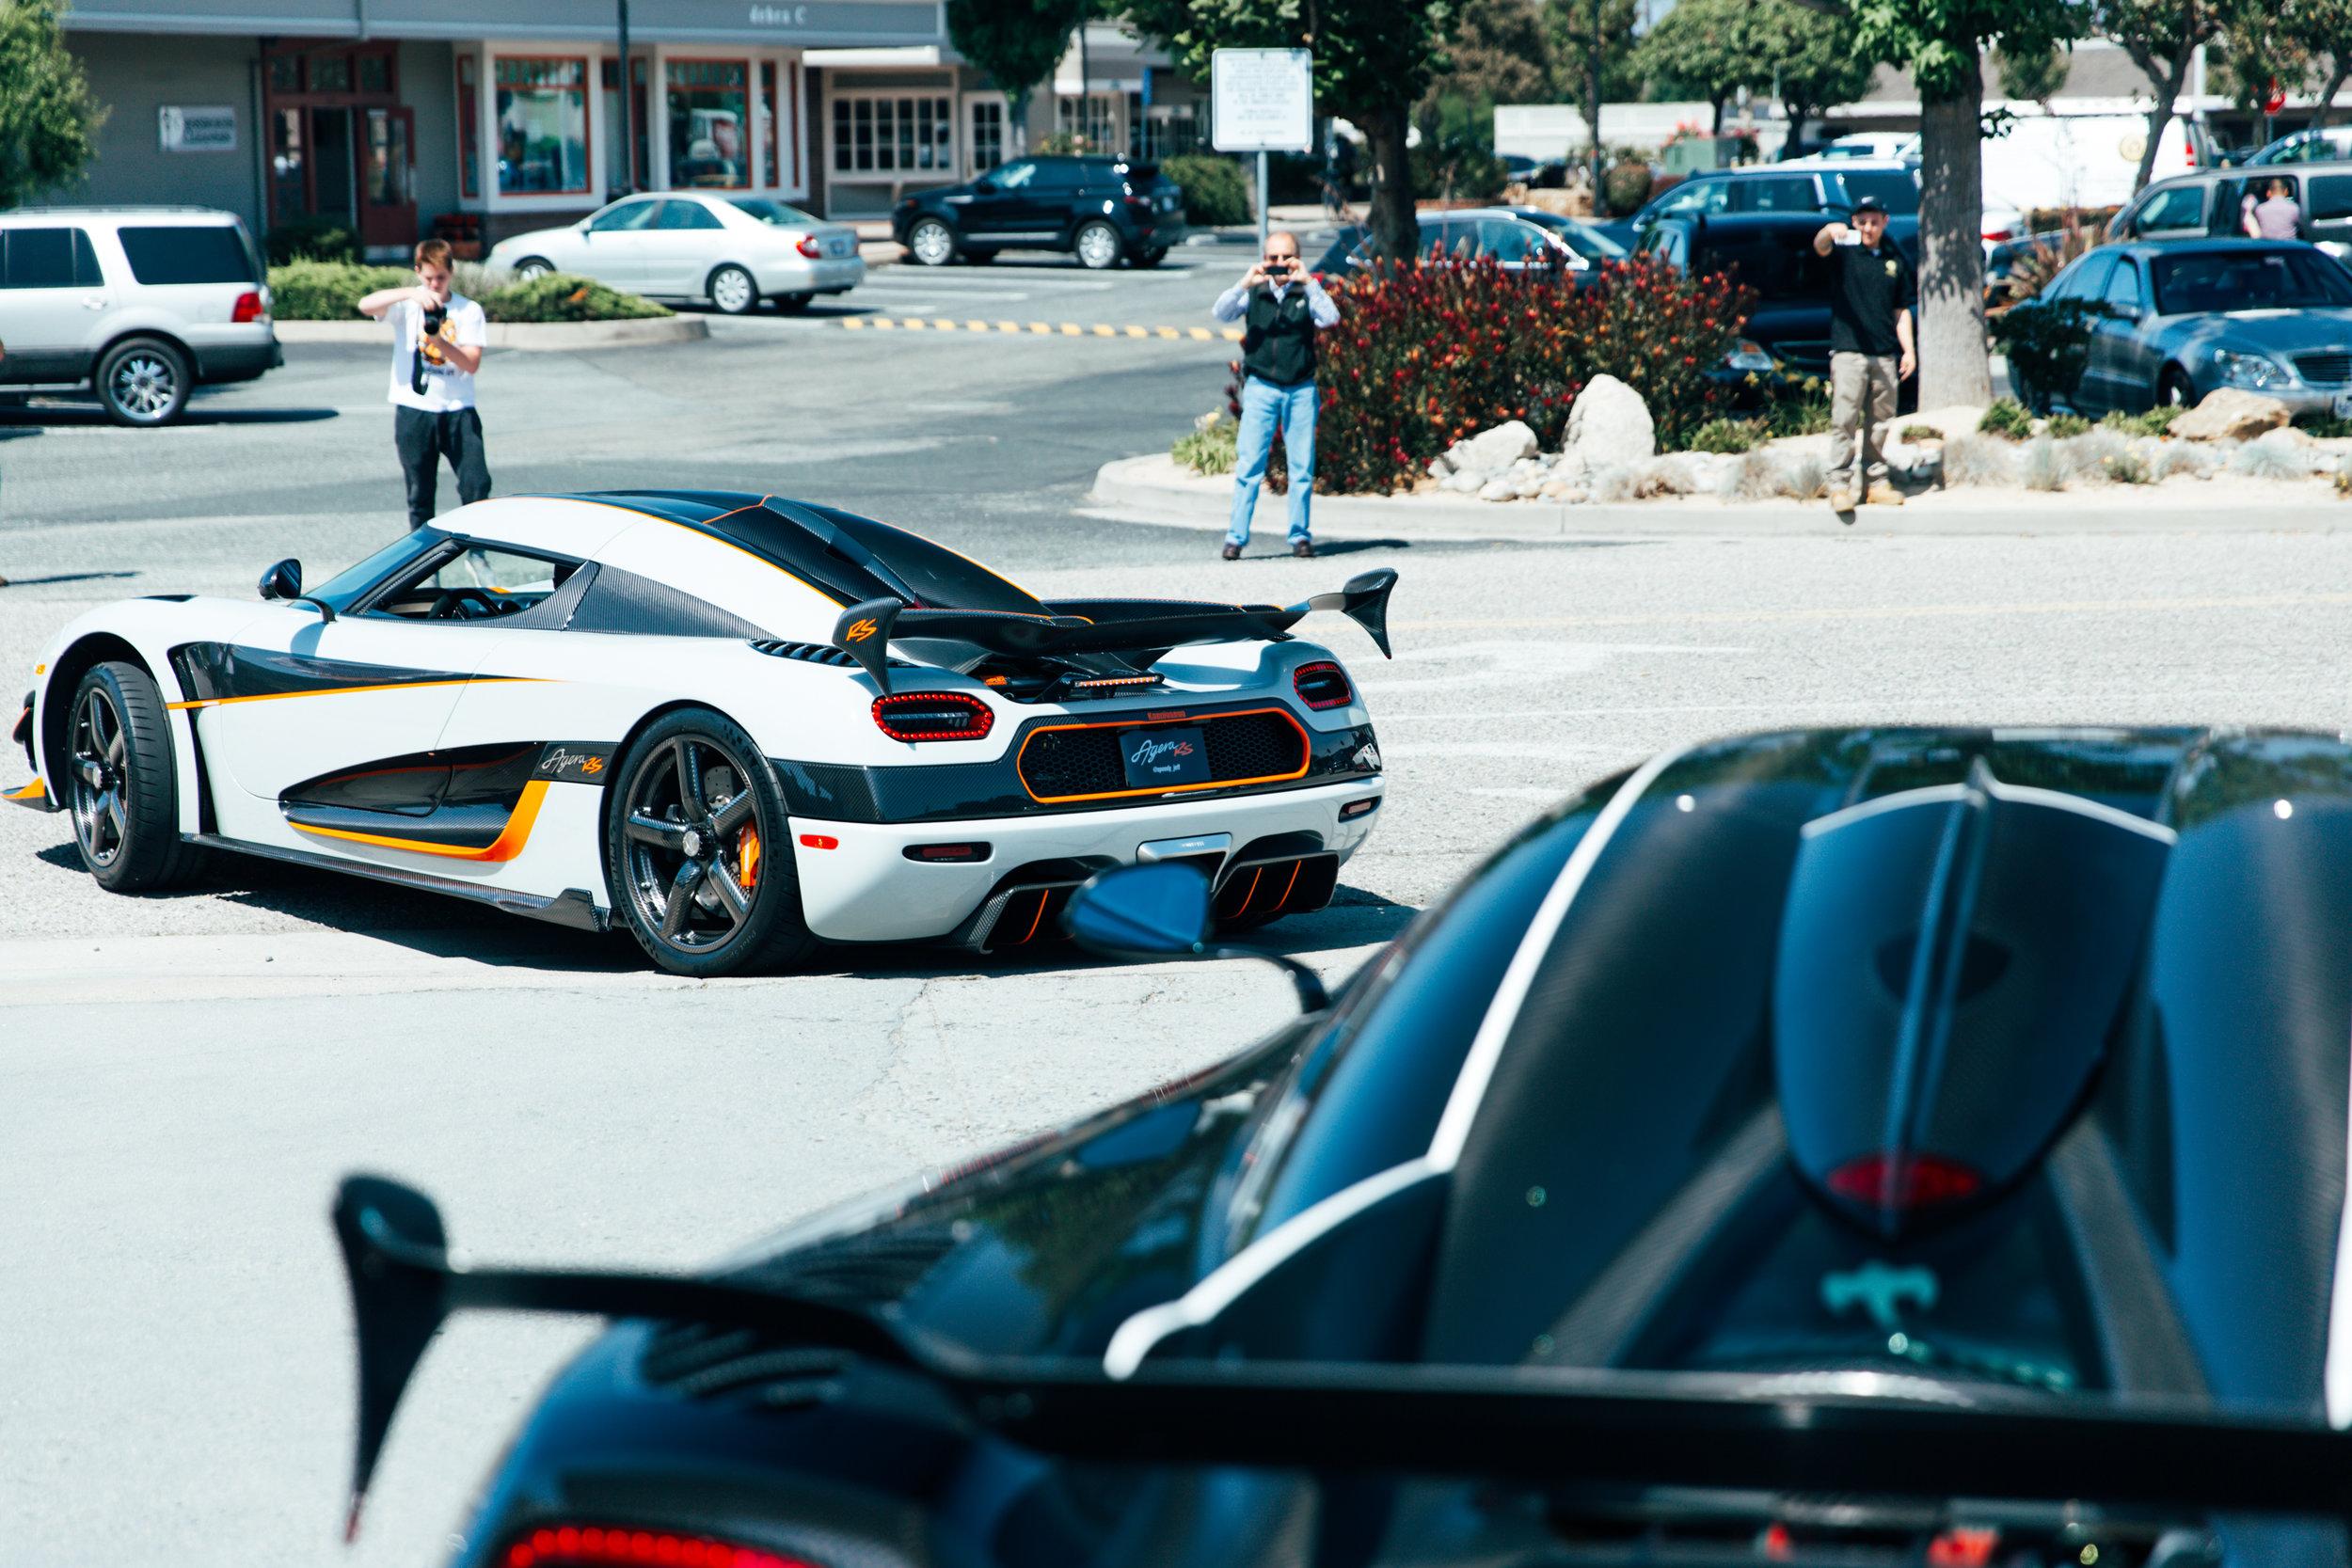 Stay_Driven_Monterey_Car_Week_Koenigsegg-67.jpg